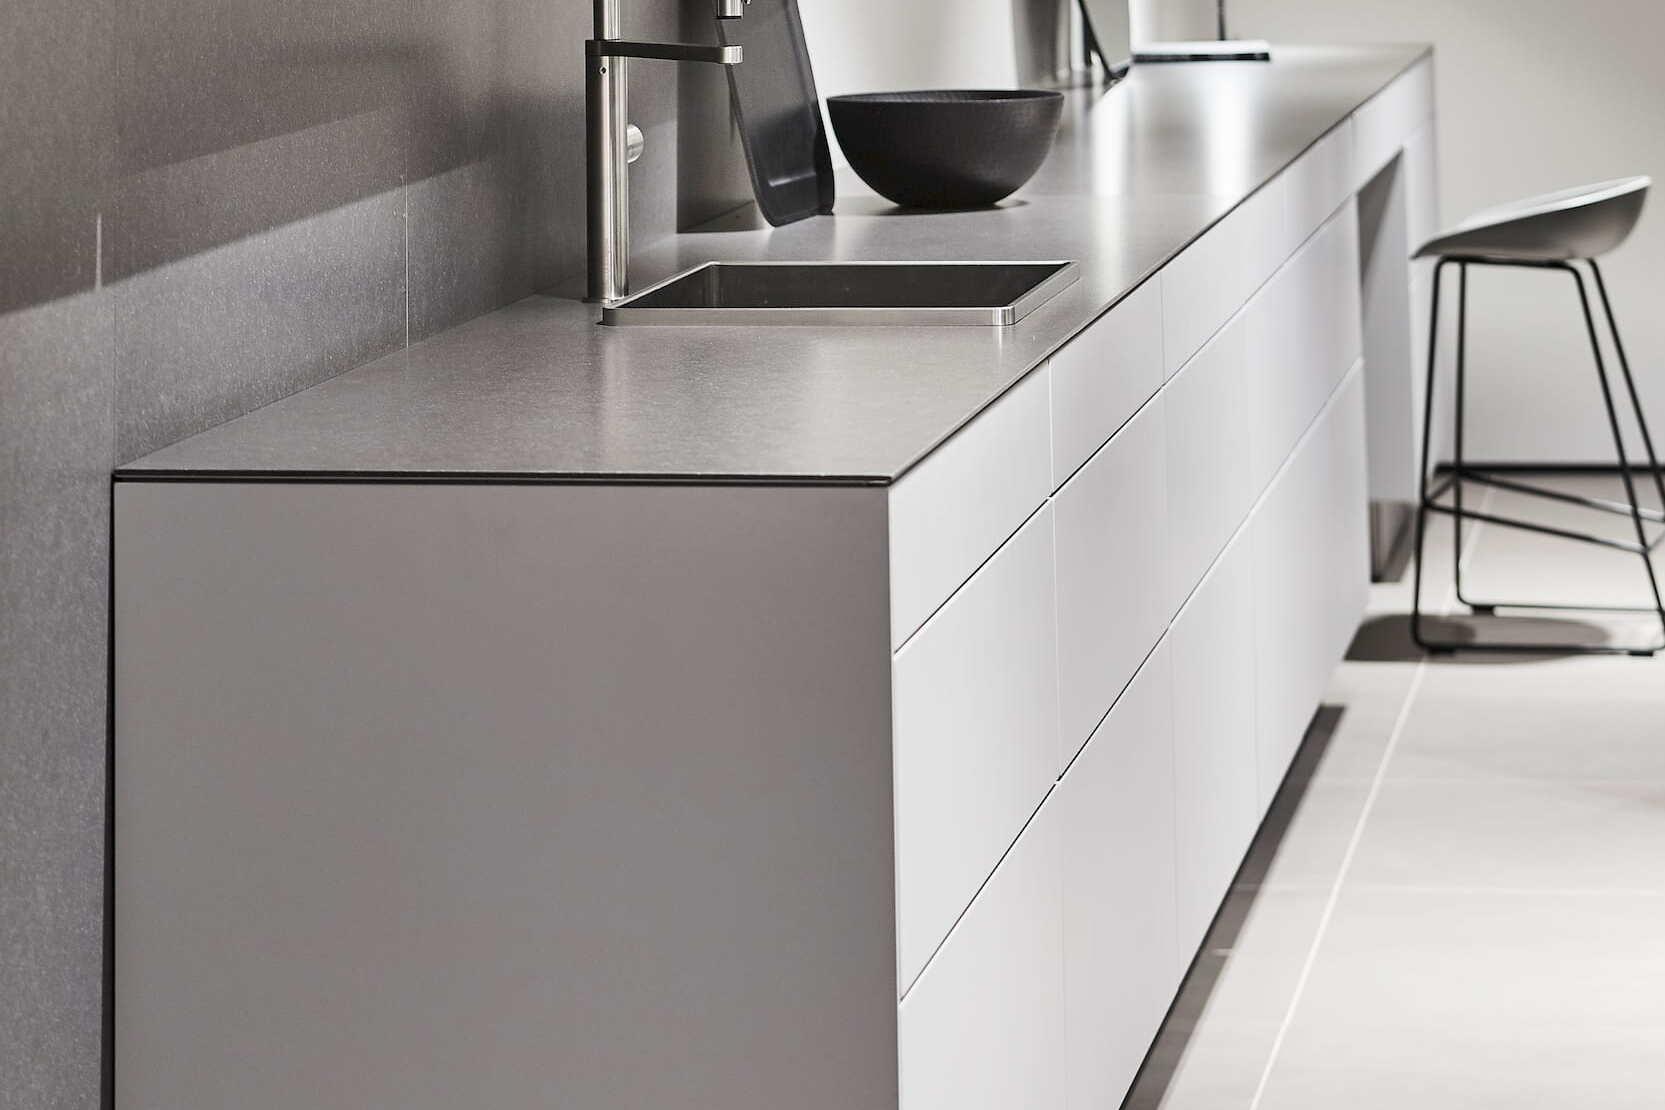 Witte keuken met rvs werkblad